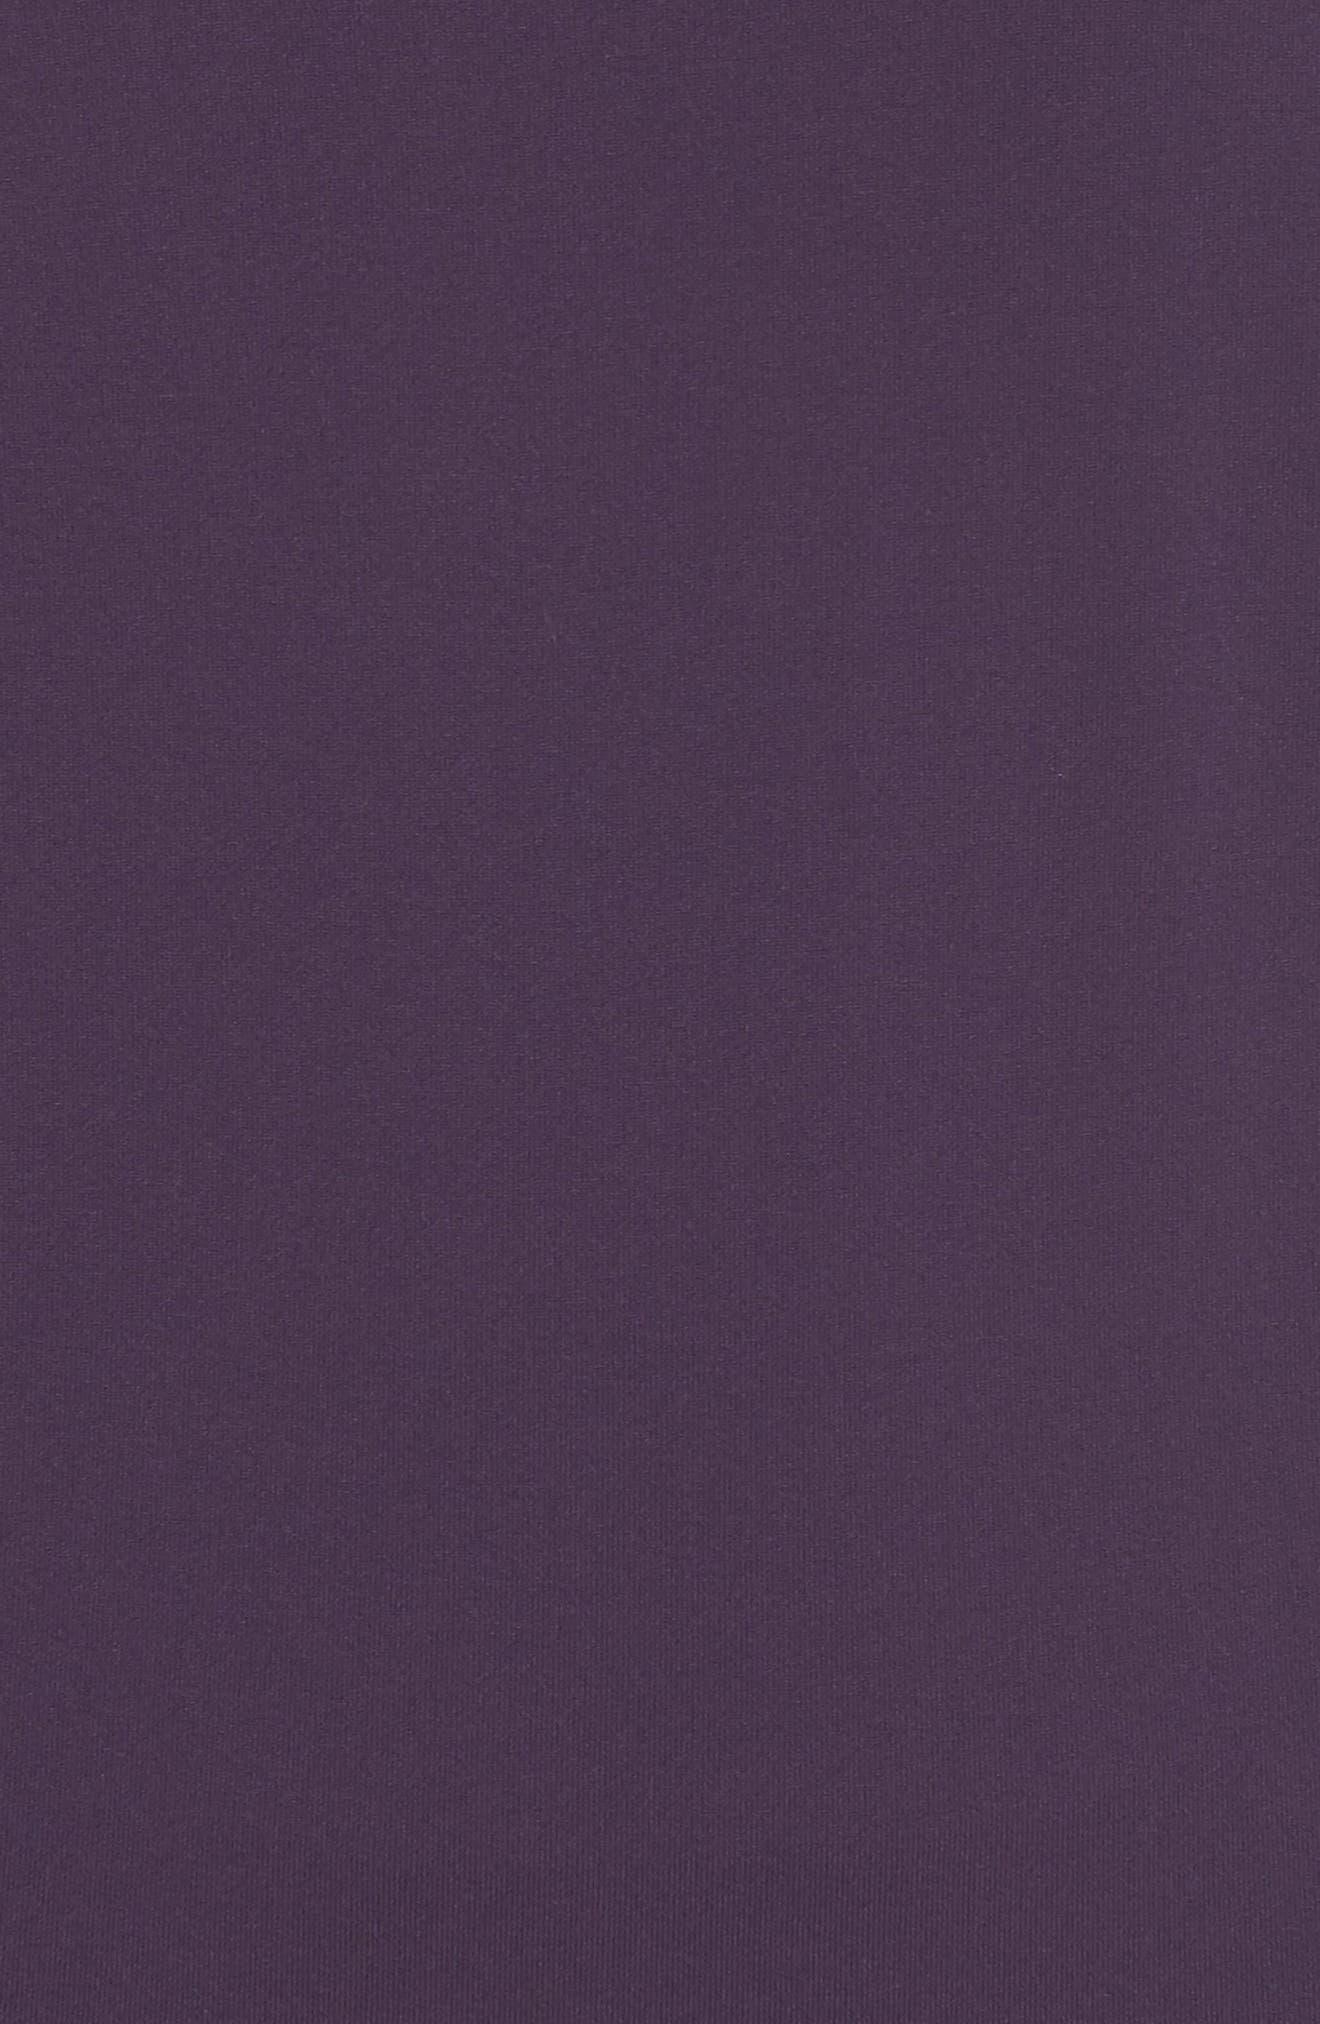 SWEATY BETTY,                             Dharana Yoga Tee,                             Alternate thumbnail 6, color,                             500